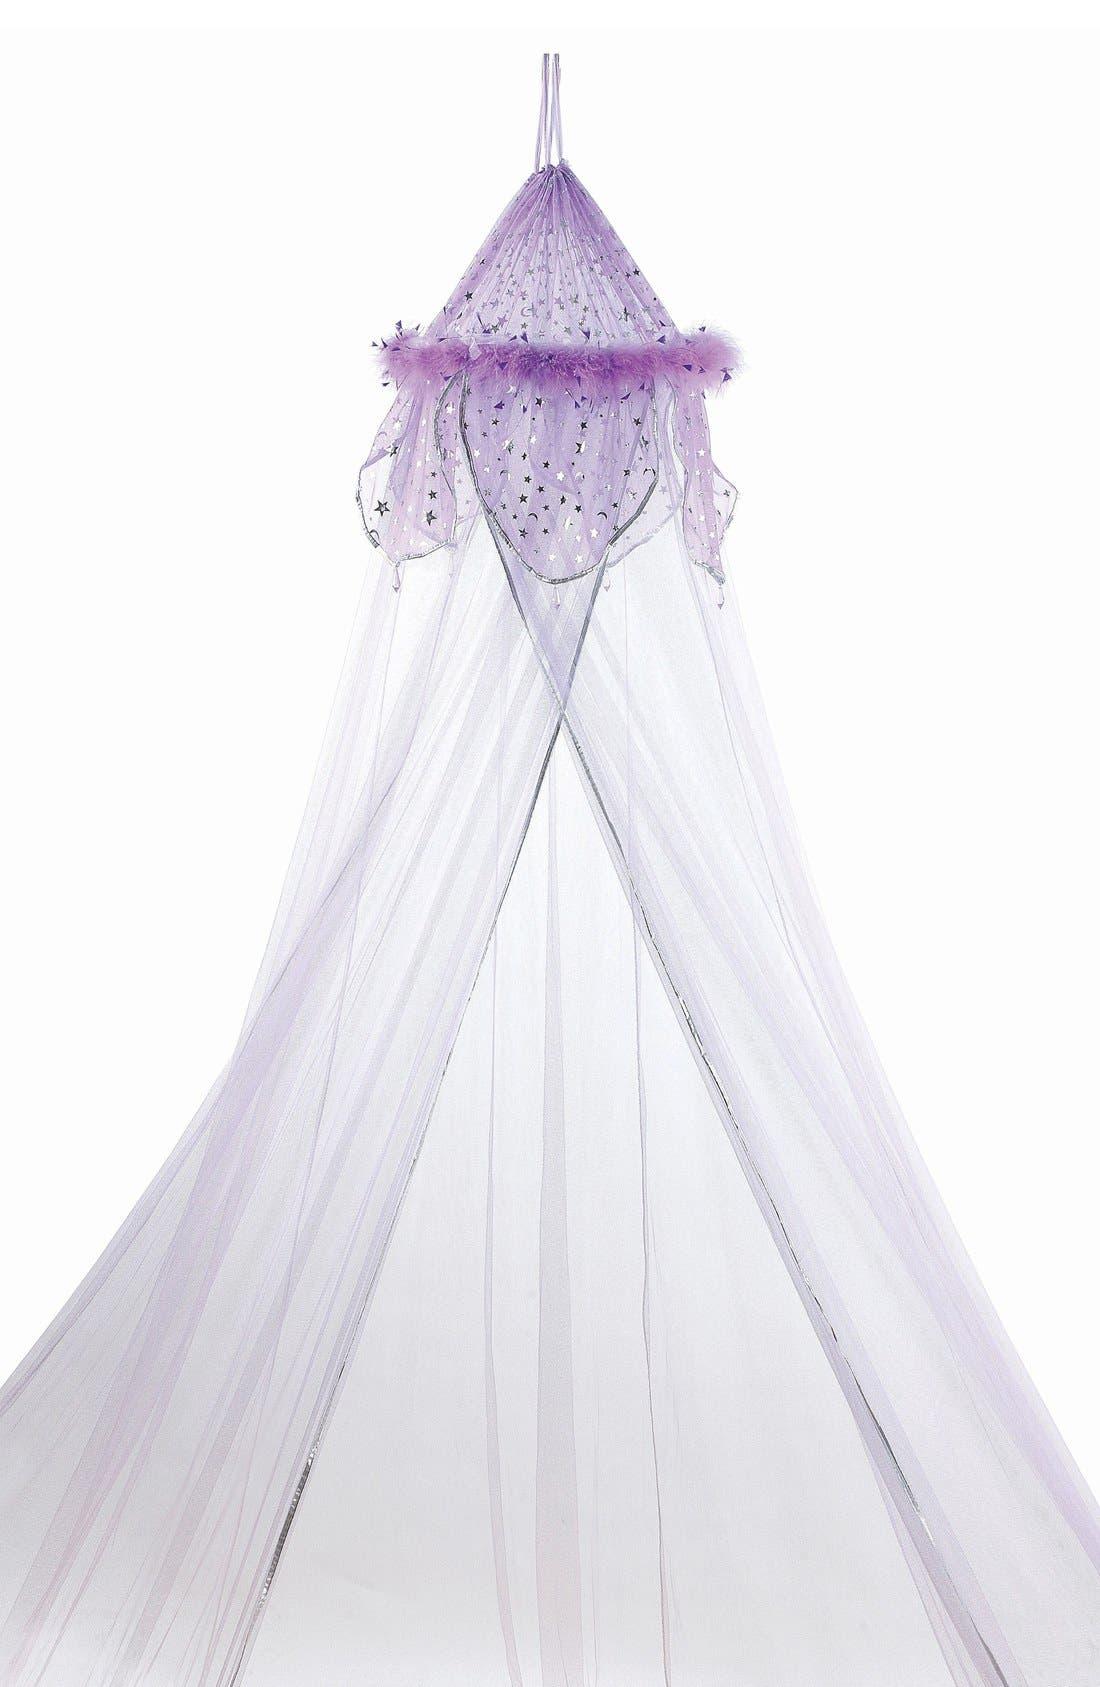 3C4G 'Lavender Fantasy' Bed Canopy